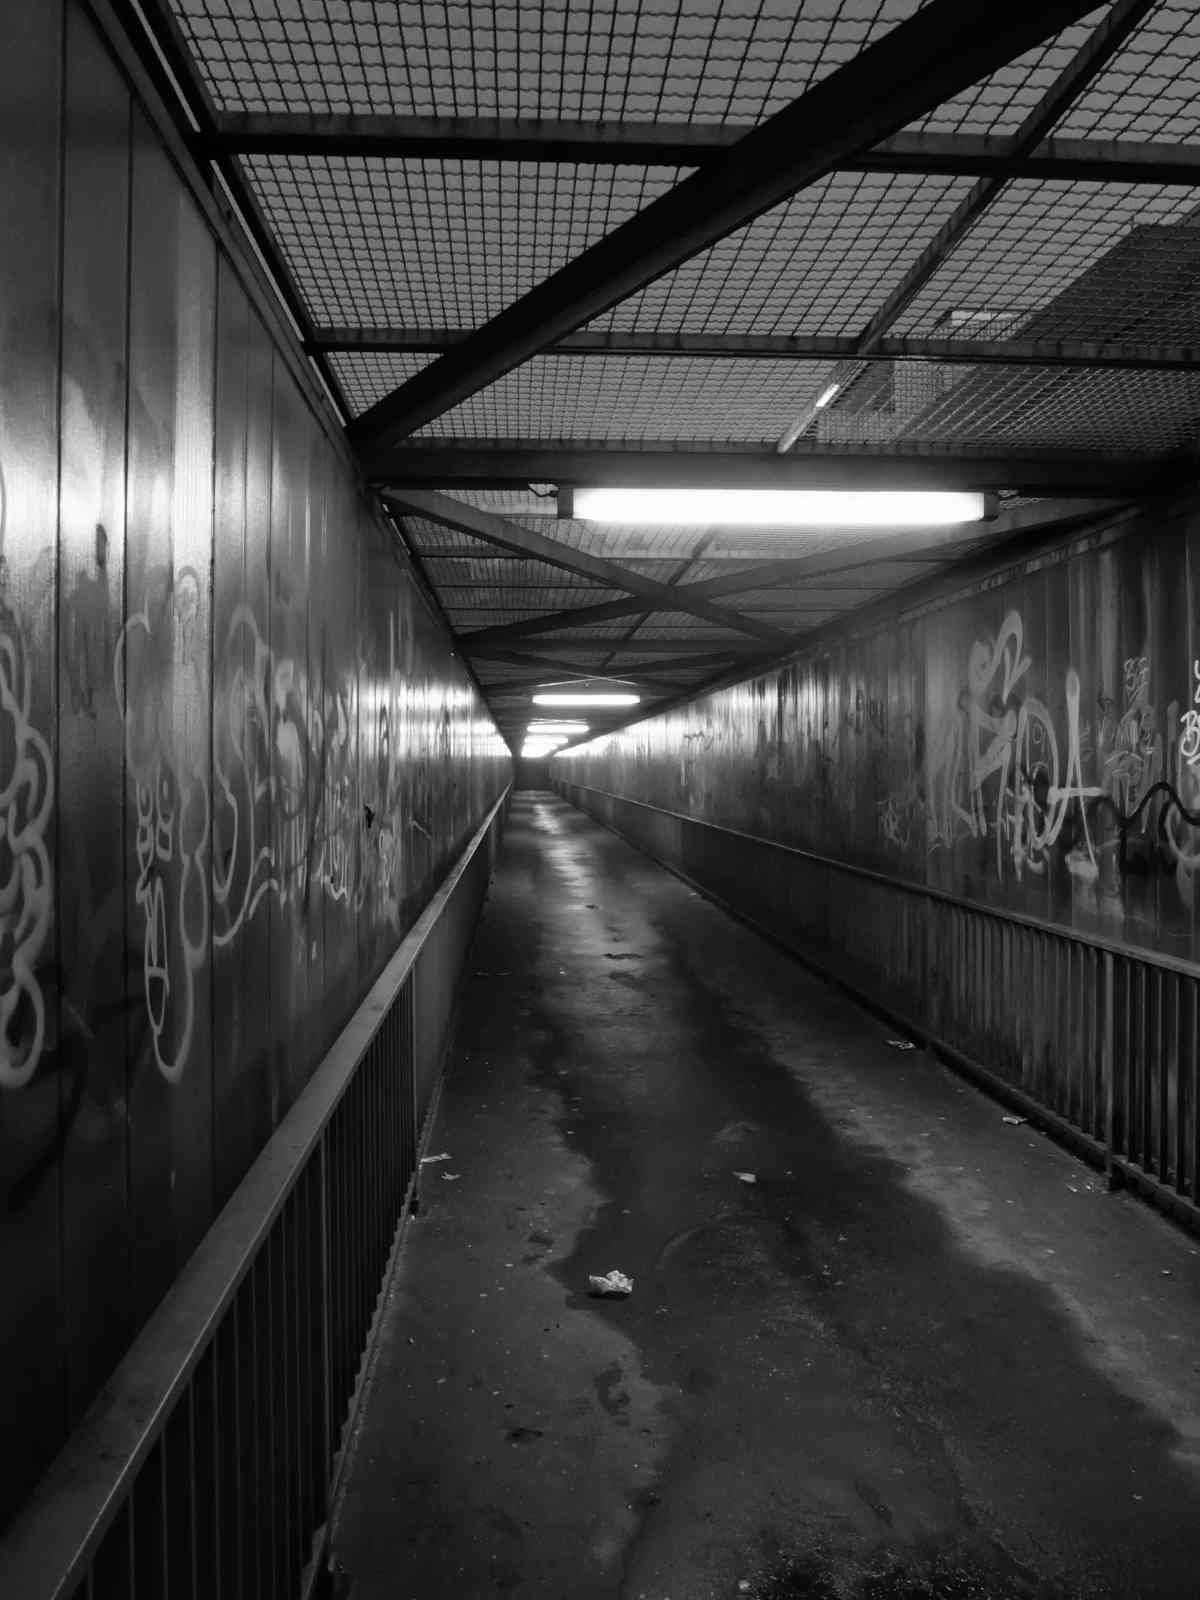 Tiergartentreppe - Gruselgang